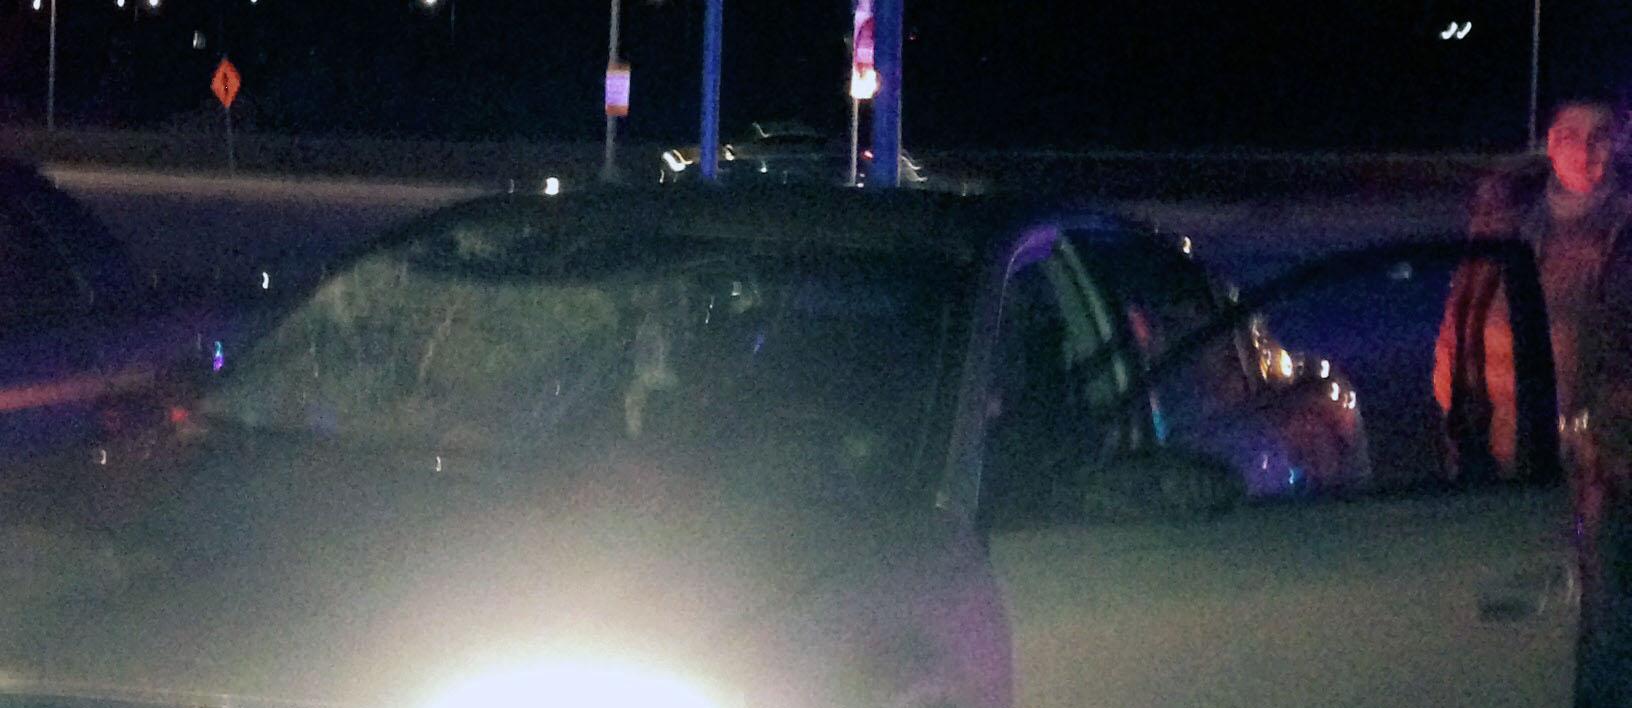 Accident scene on U.S. 40- near Route 1